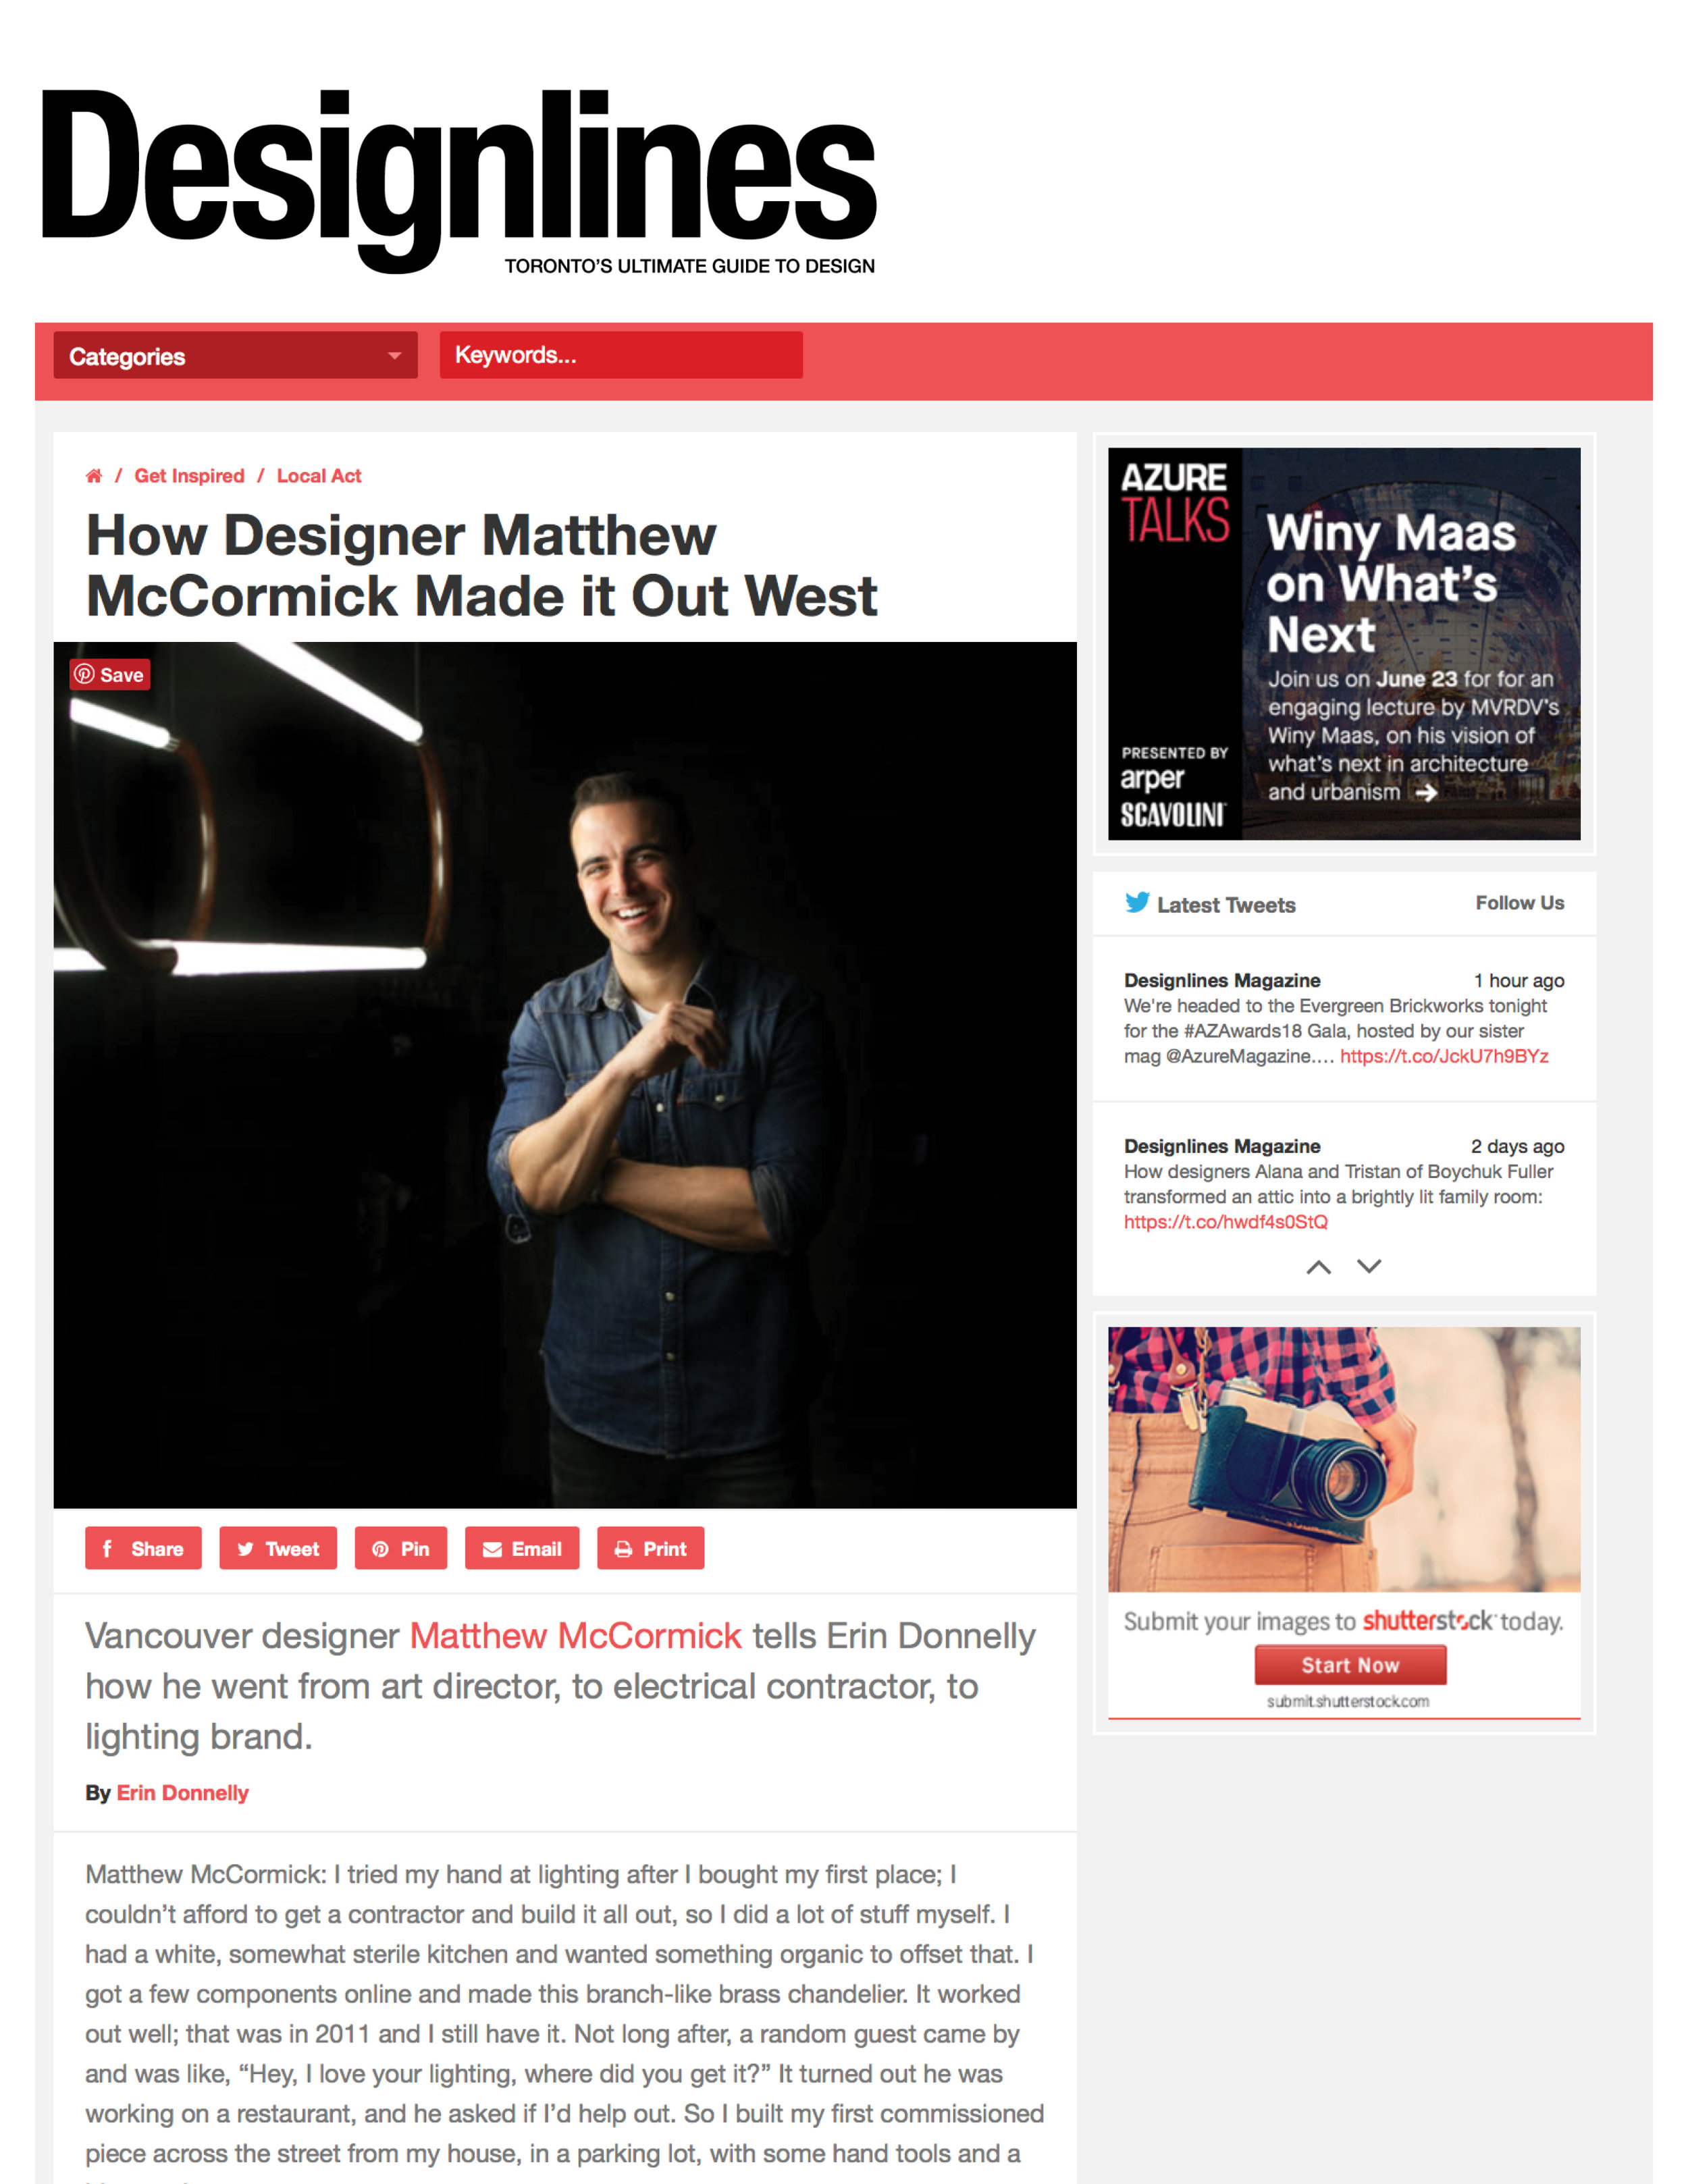 Designlines May 2018